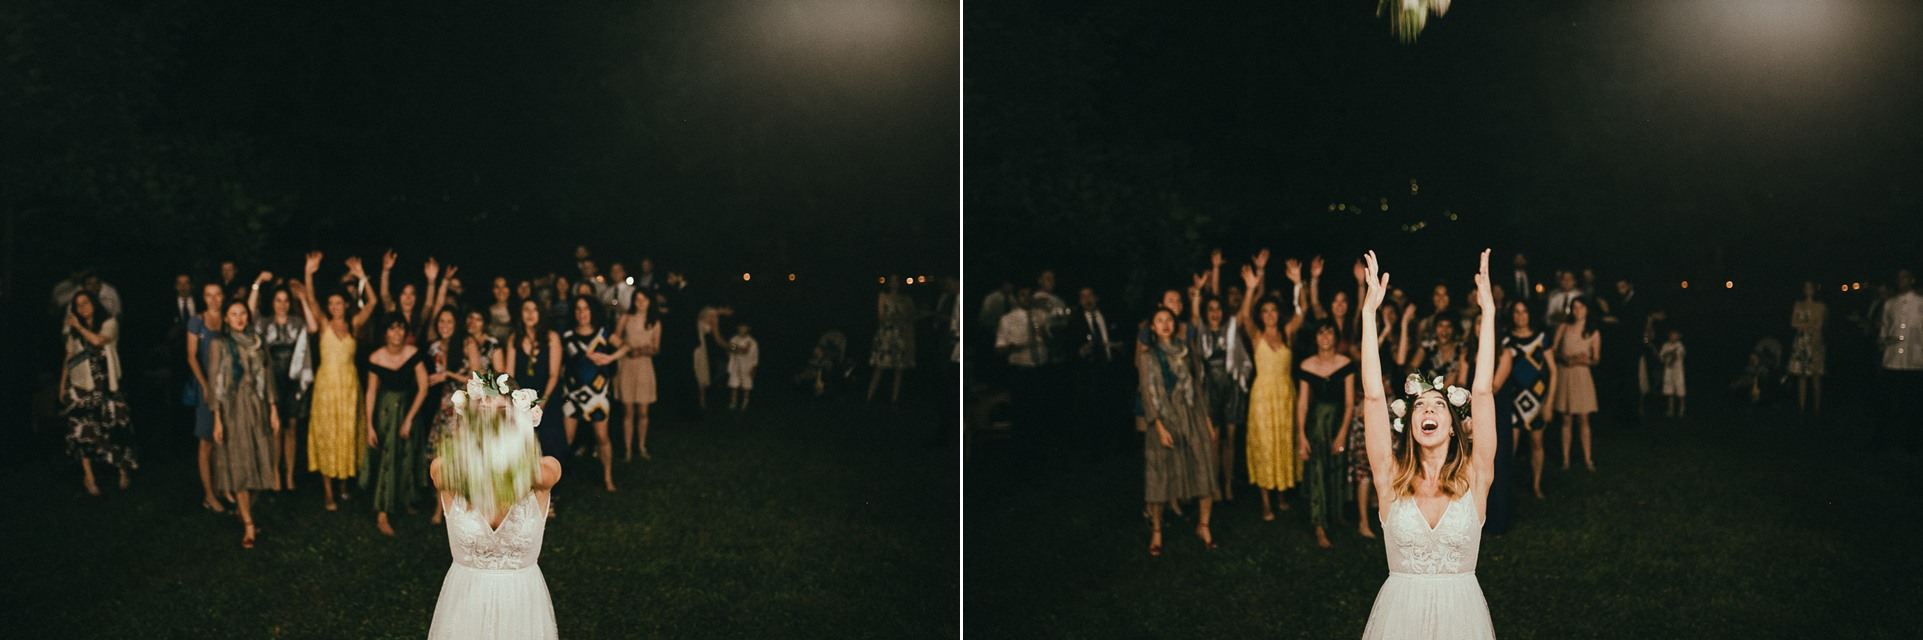 131-bride-bouquet-launch.jpg